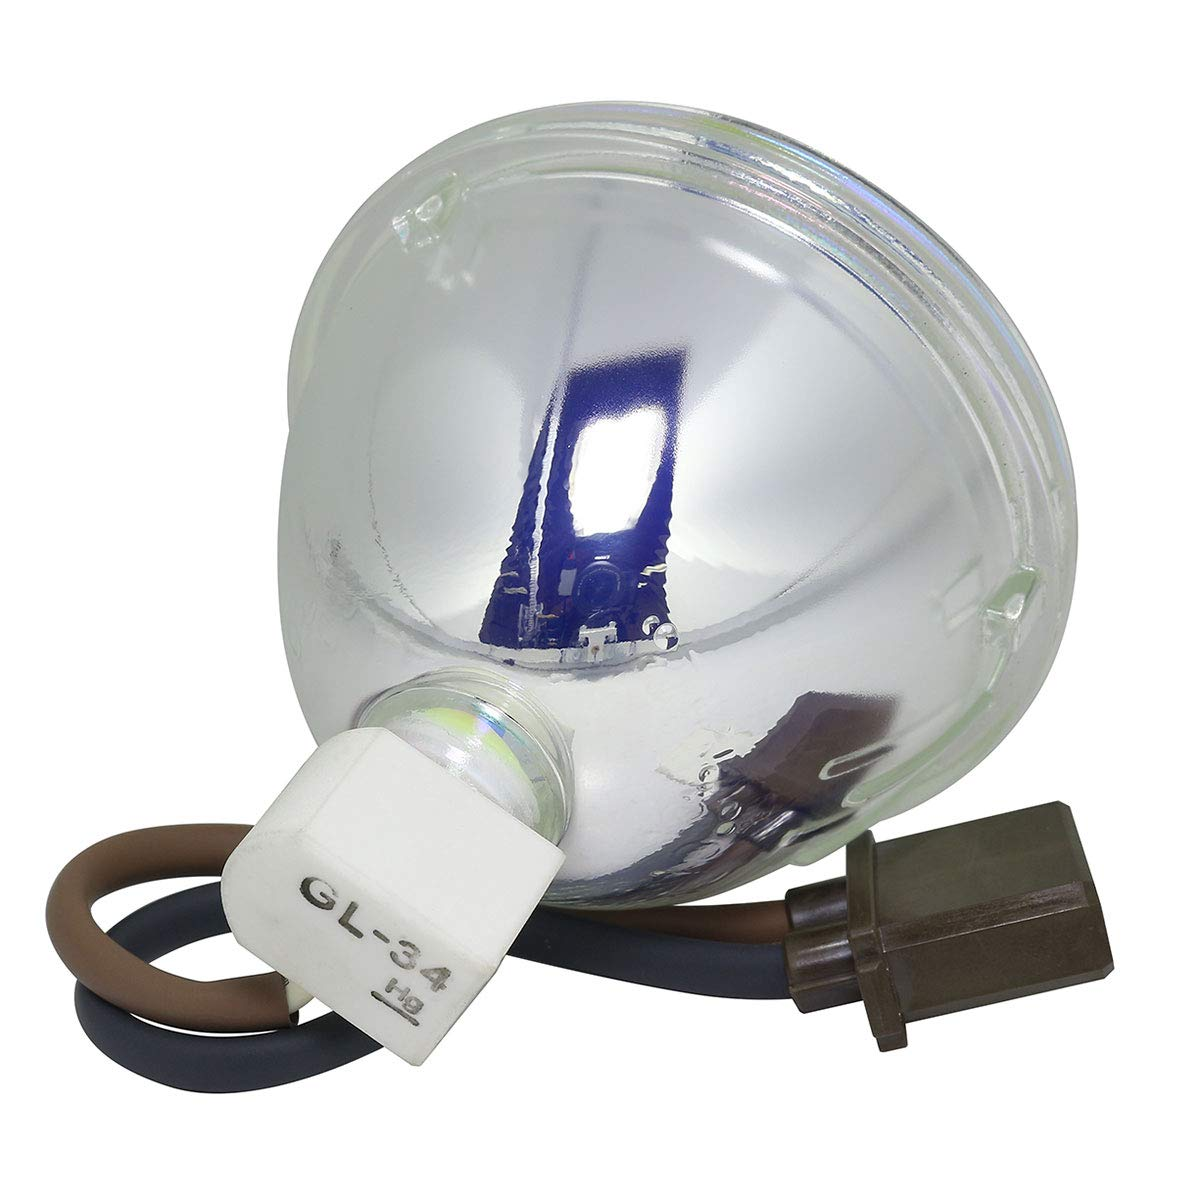 SpArc Platinum for Toshiba TB25-LMP TV Lamp with Enclosure Original Bulb Inside